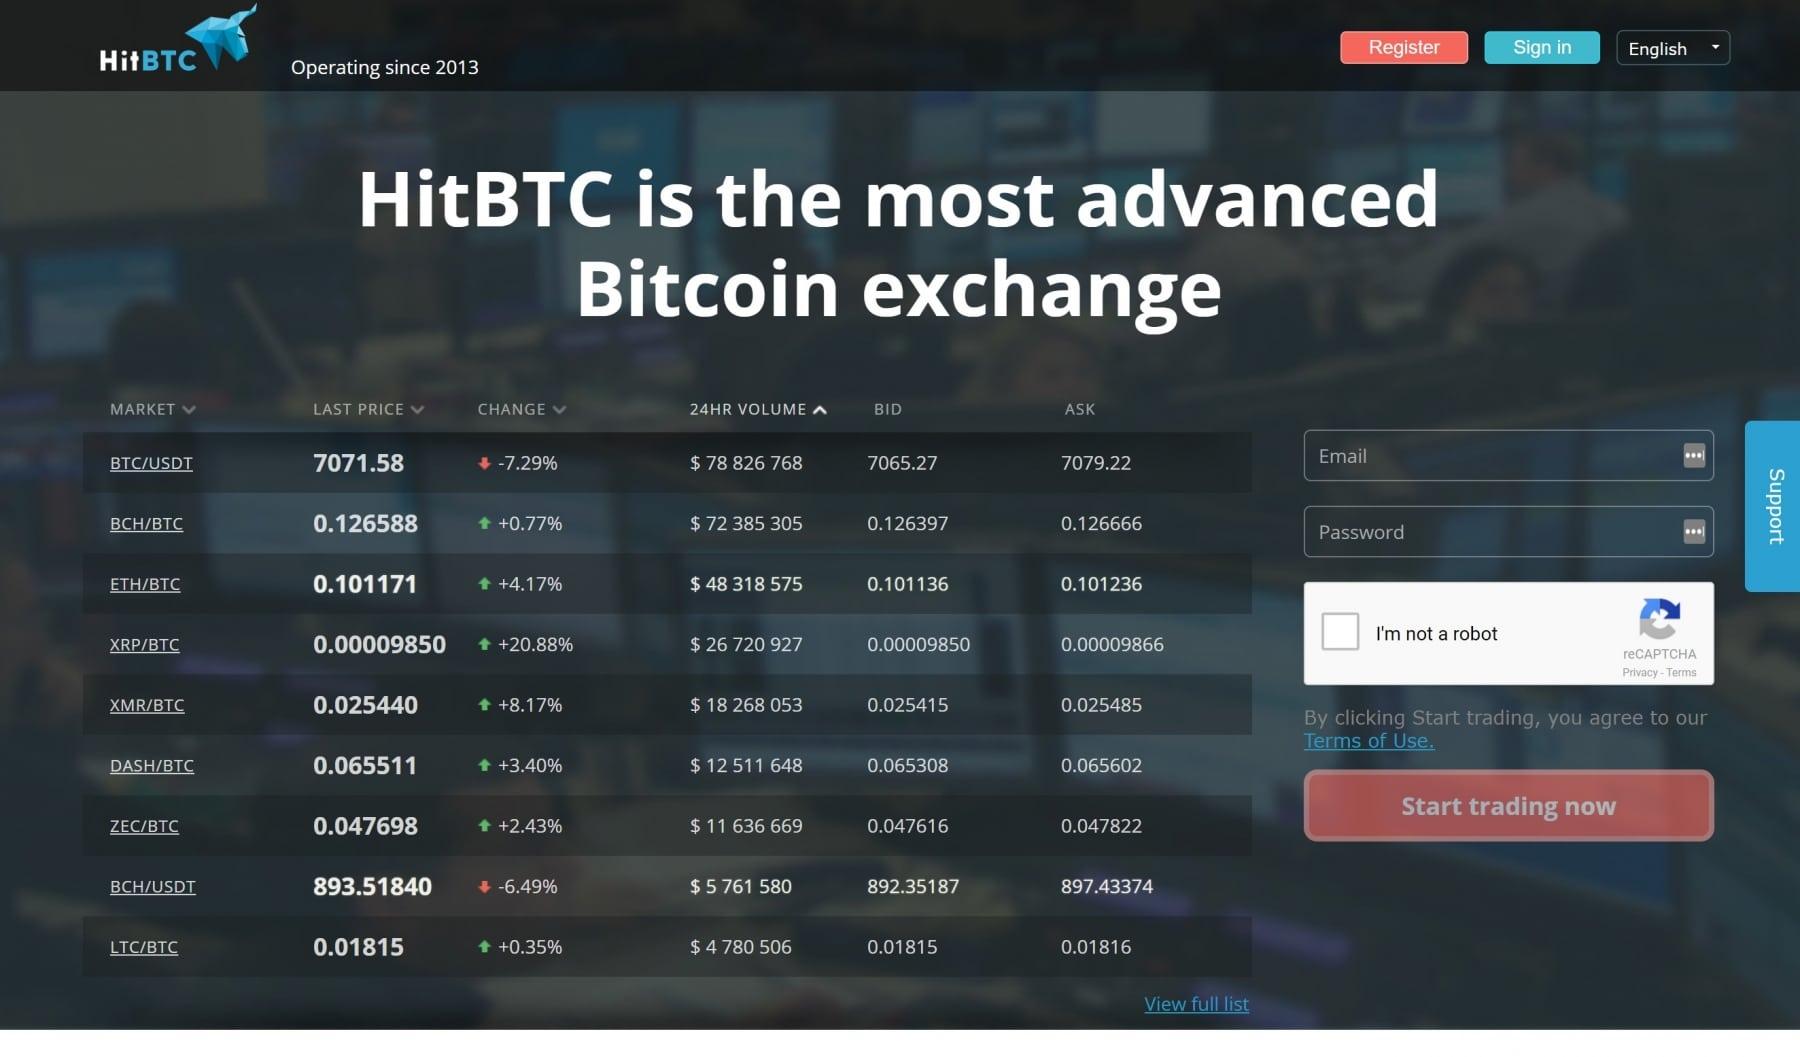 hitbtc bitcoin exchange Information